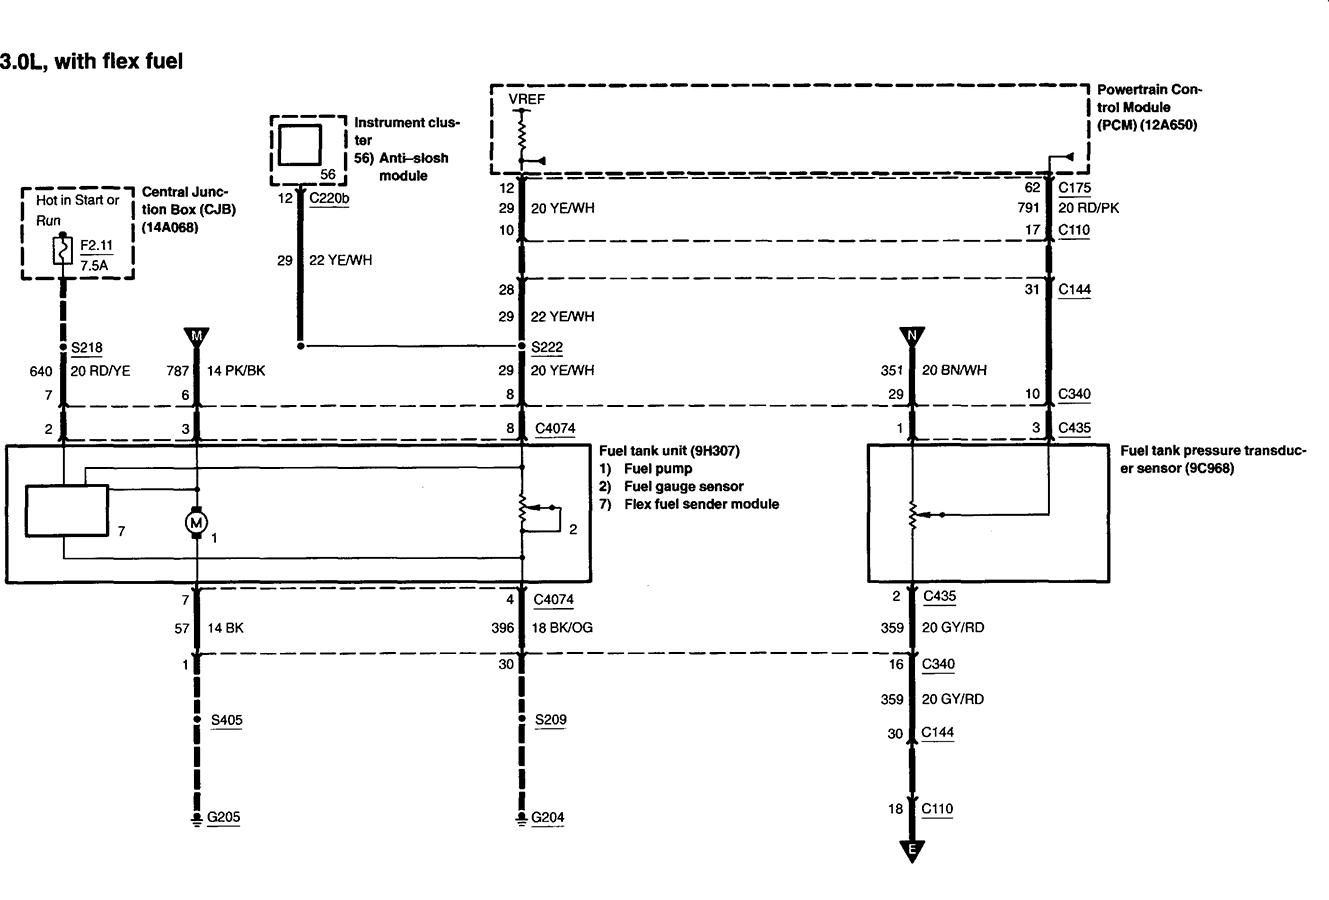 2000 F450 Fuel Gauge Wiring Diagram Full Hd Version Wiring Diagram Tomediagram Emballages Sous Vide Fr